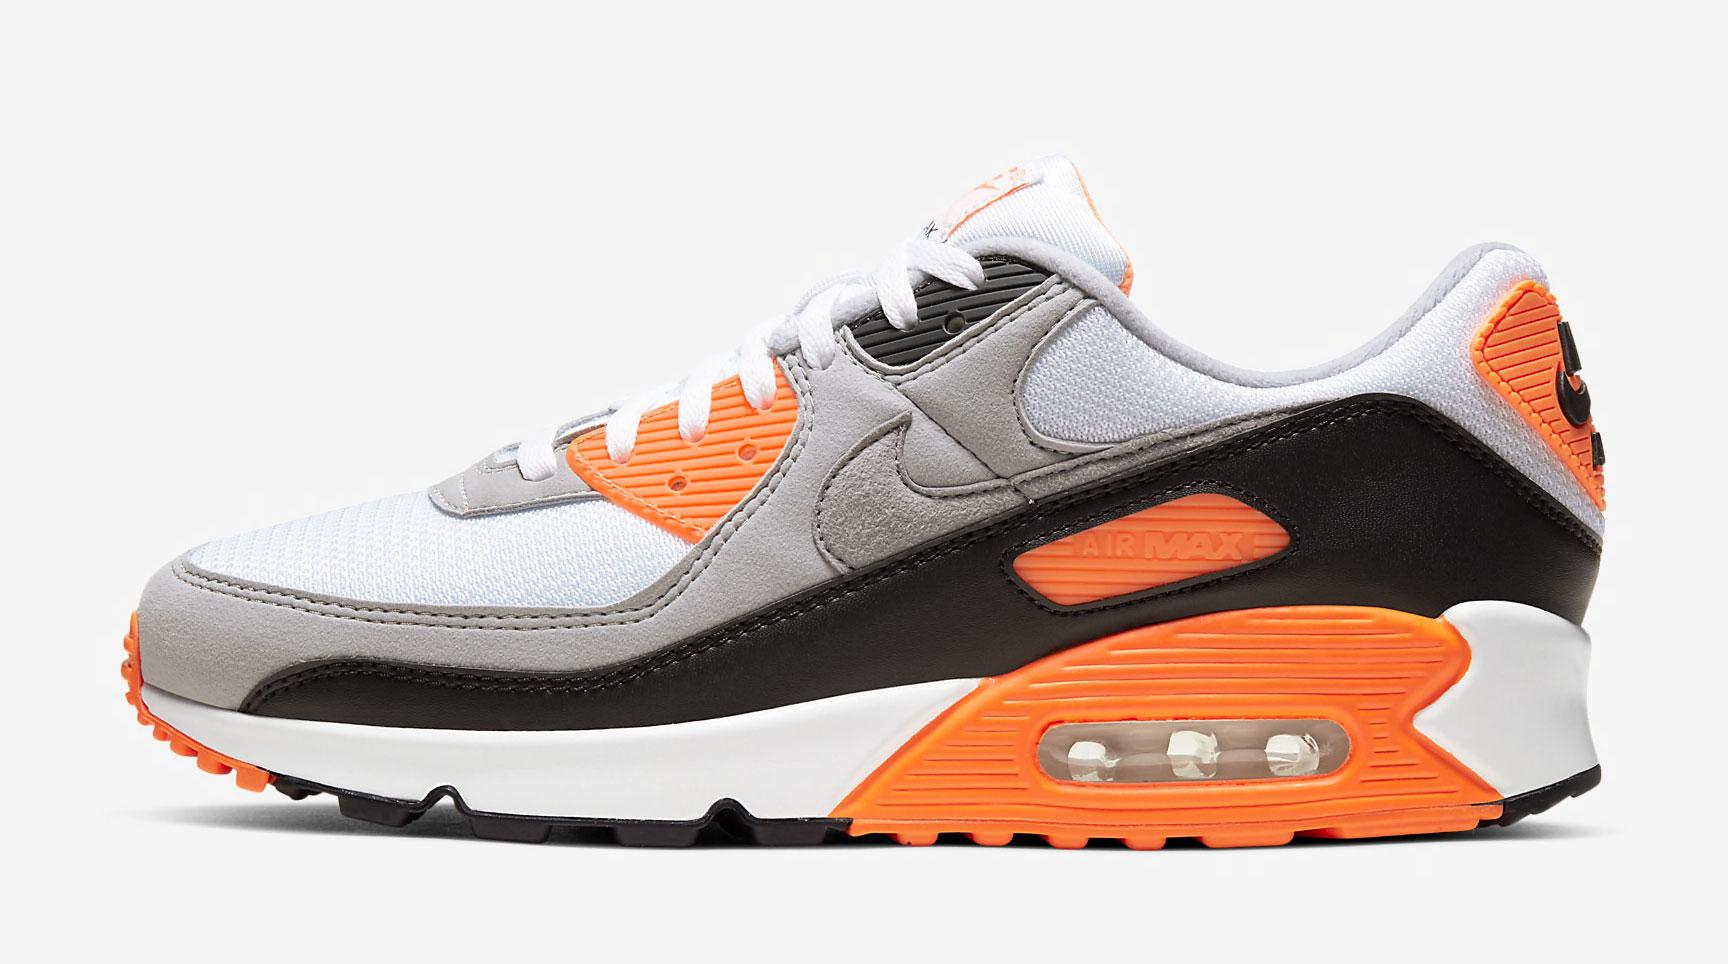 nike-air-max-90-white-grey-orange-release-date